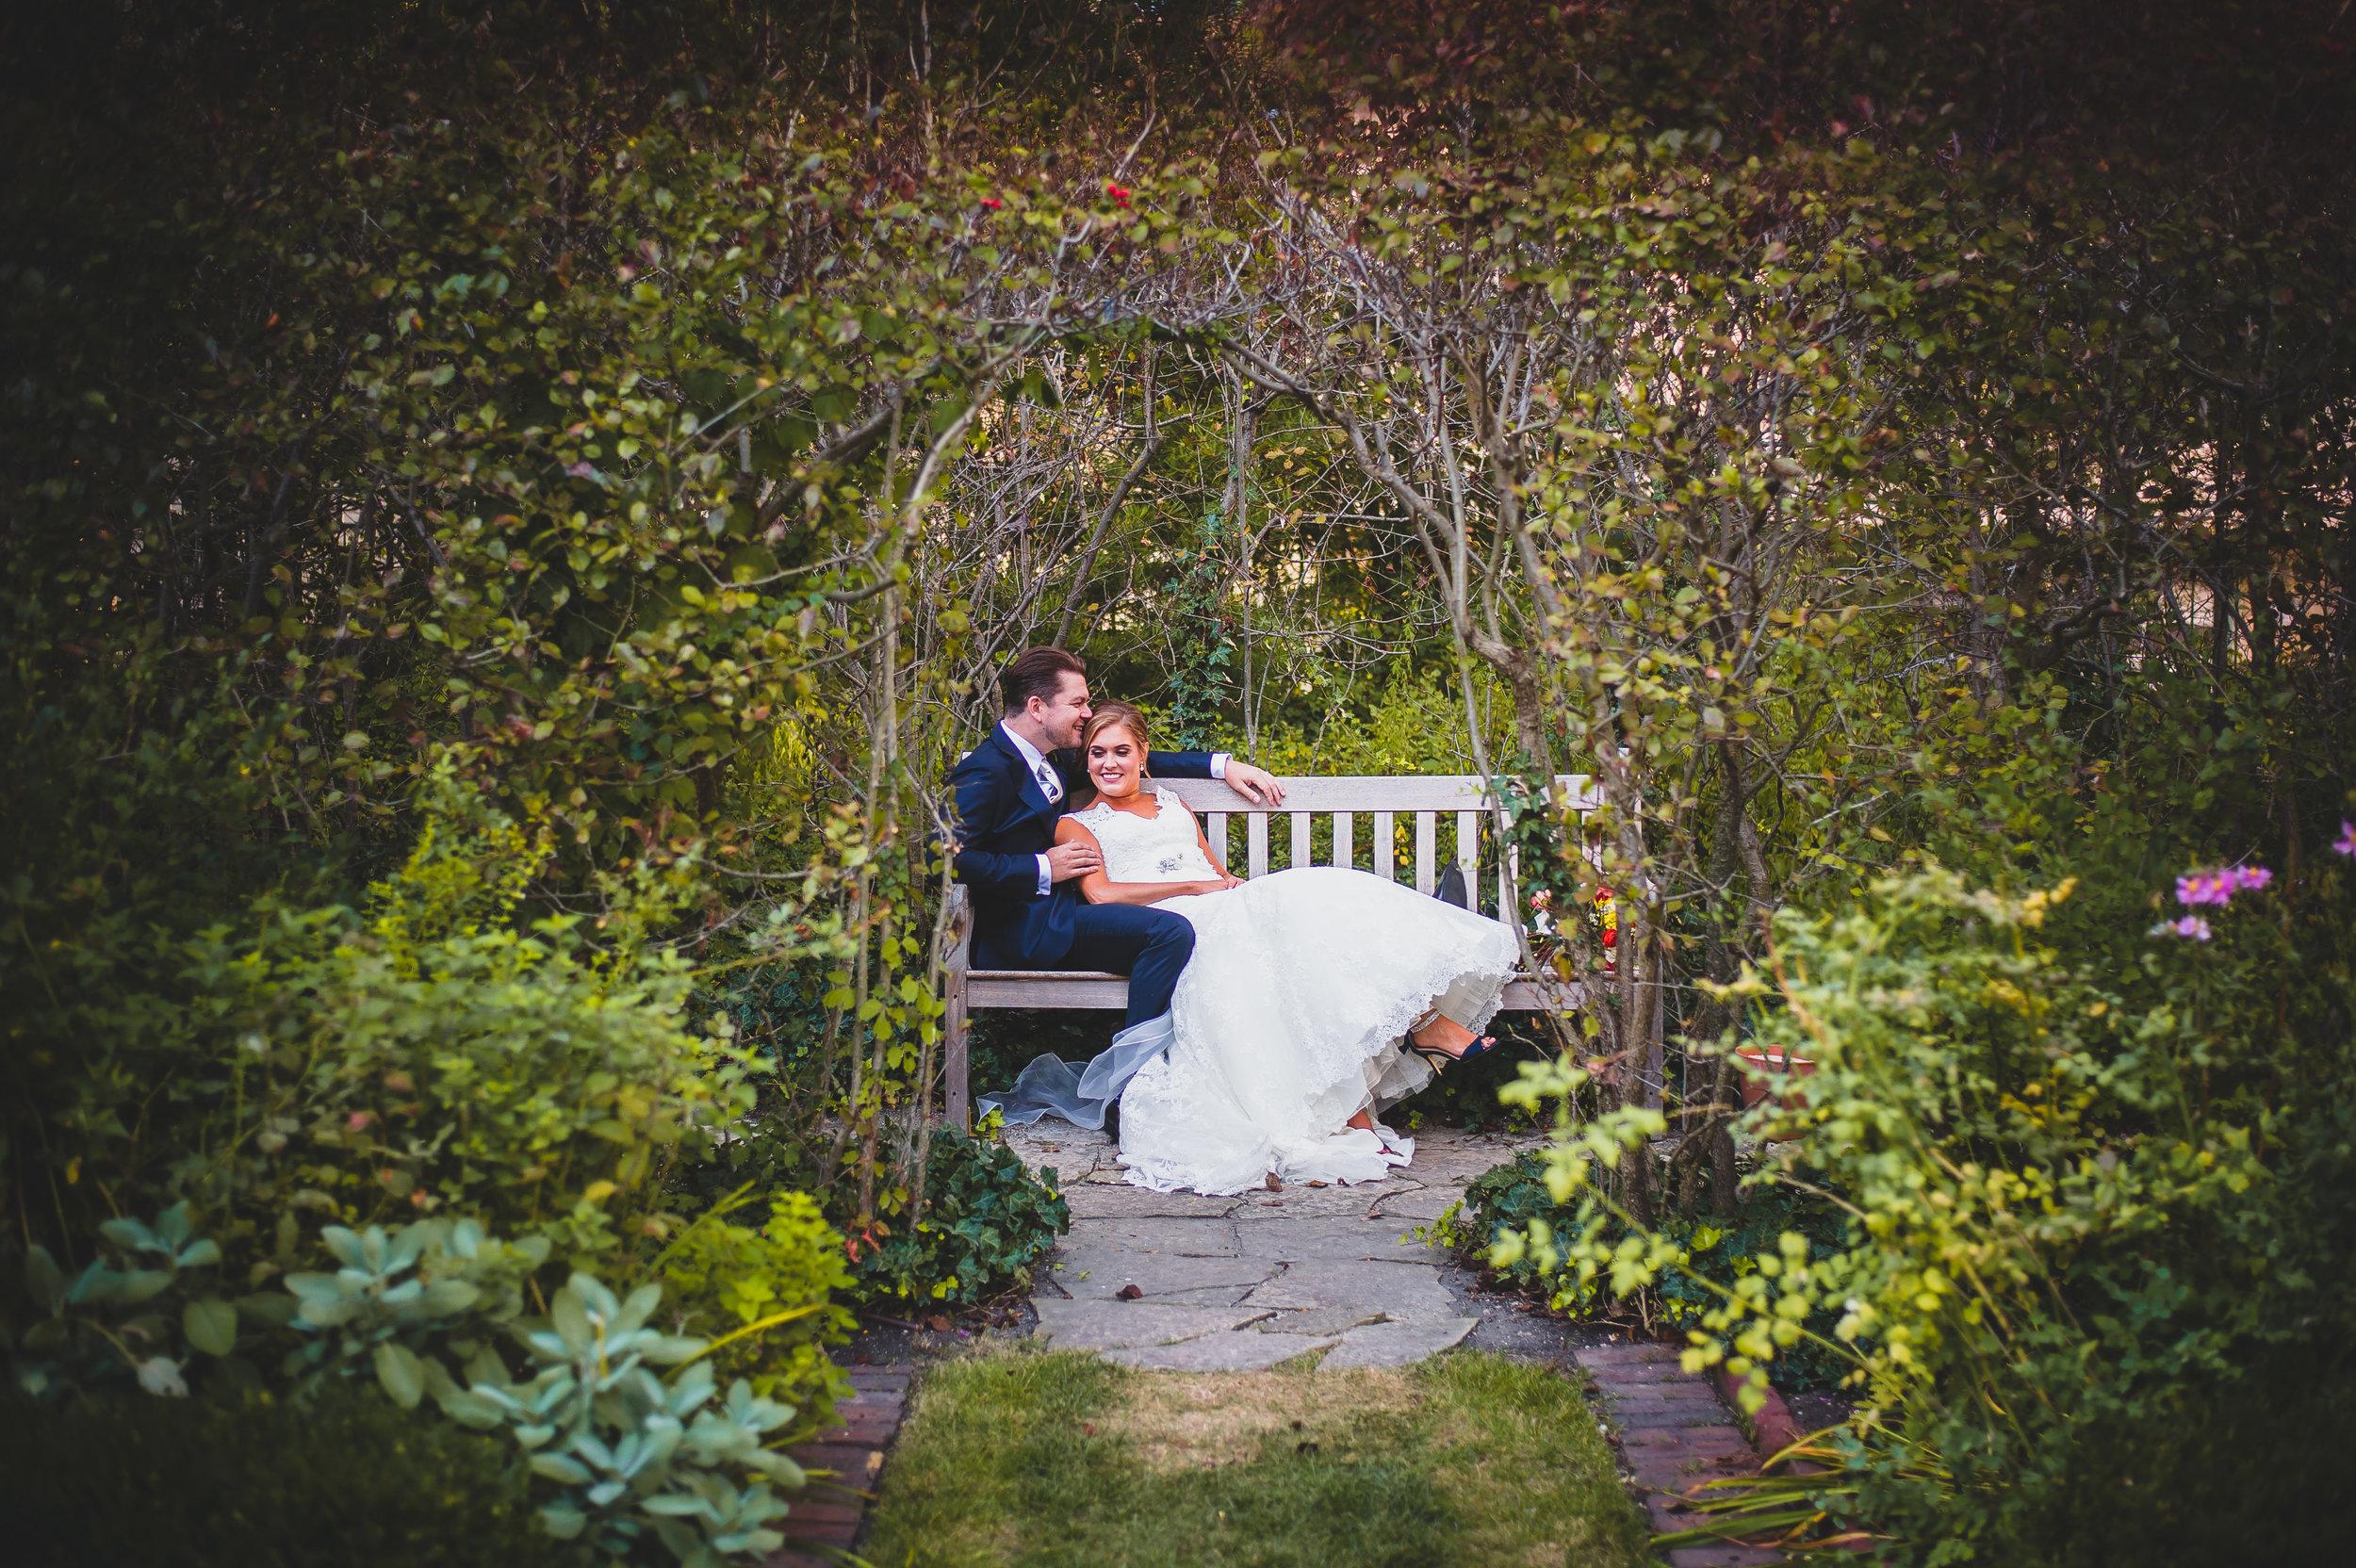 madison phil wedding_GXM_6938.jpg